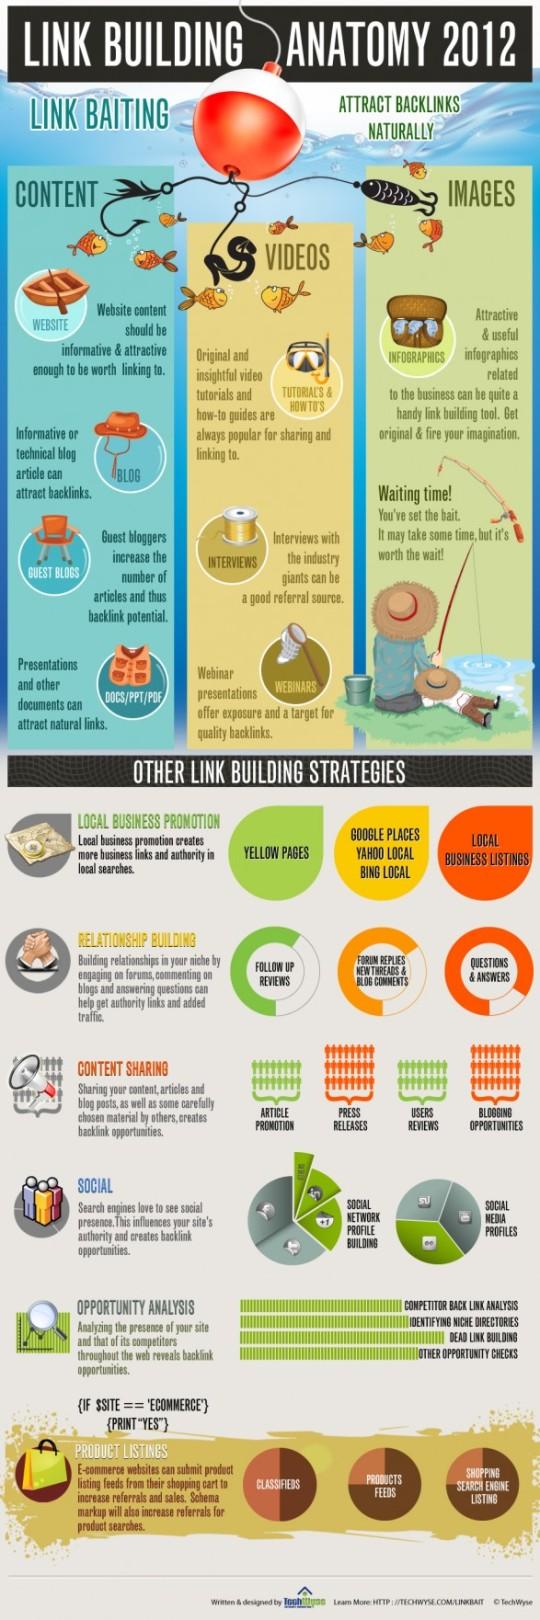 Infografía: Como construir un buen enlace.